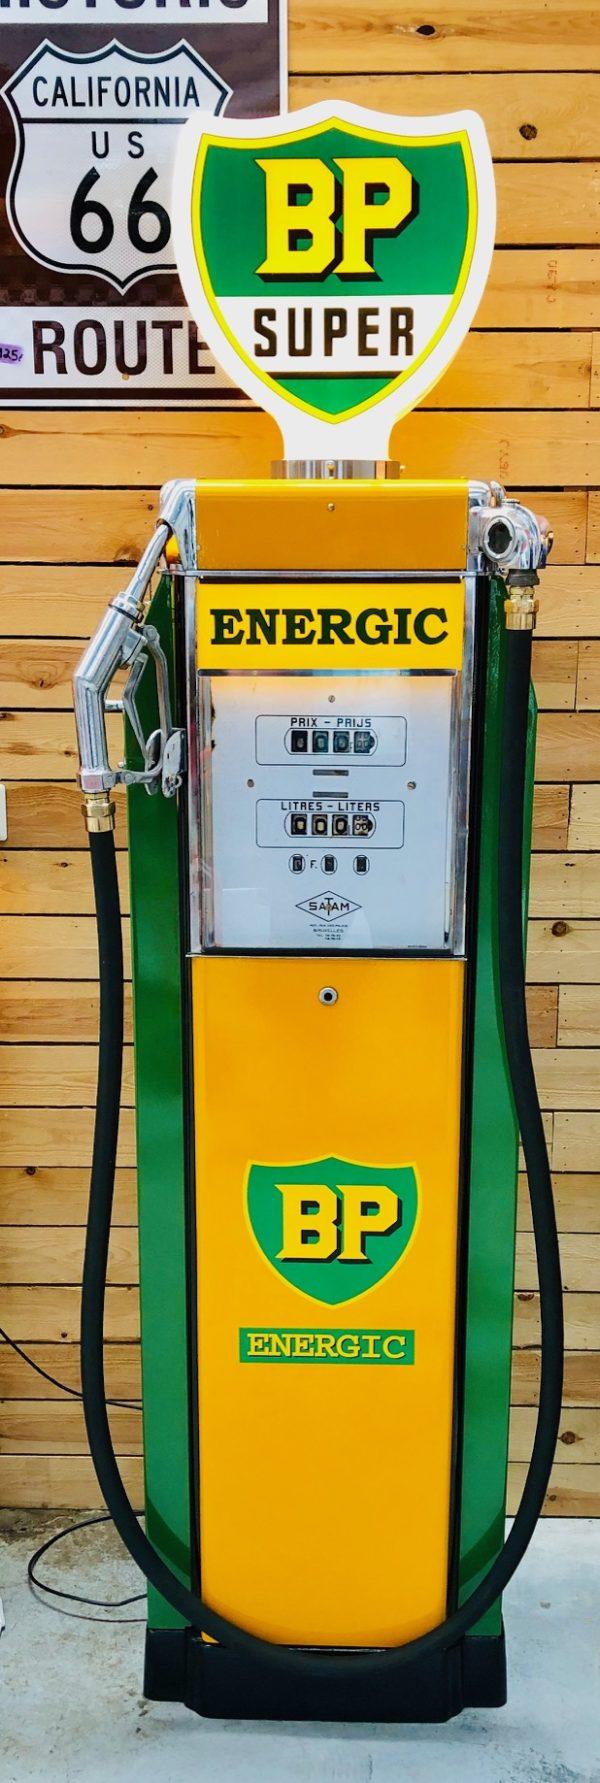 Vintage BP Energic gas pump (Satam)